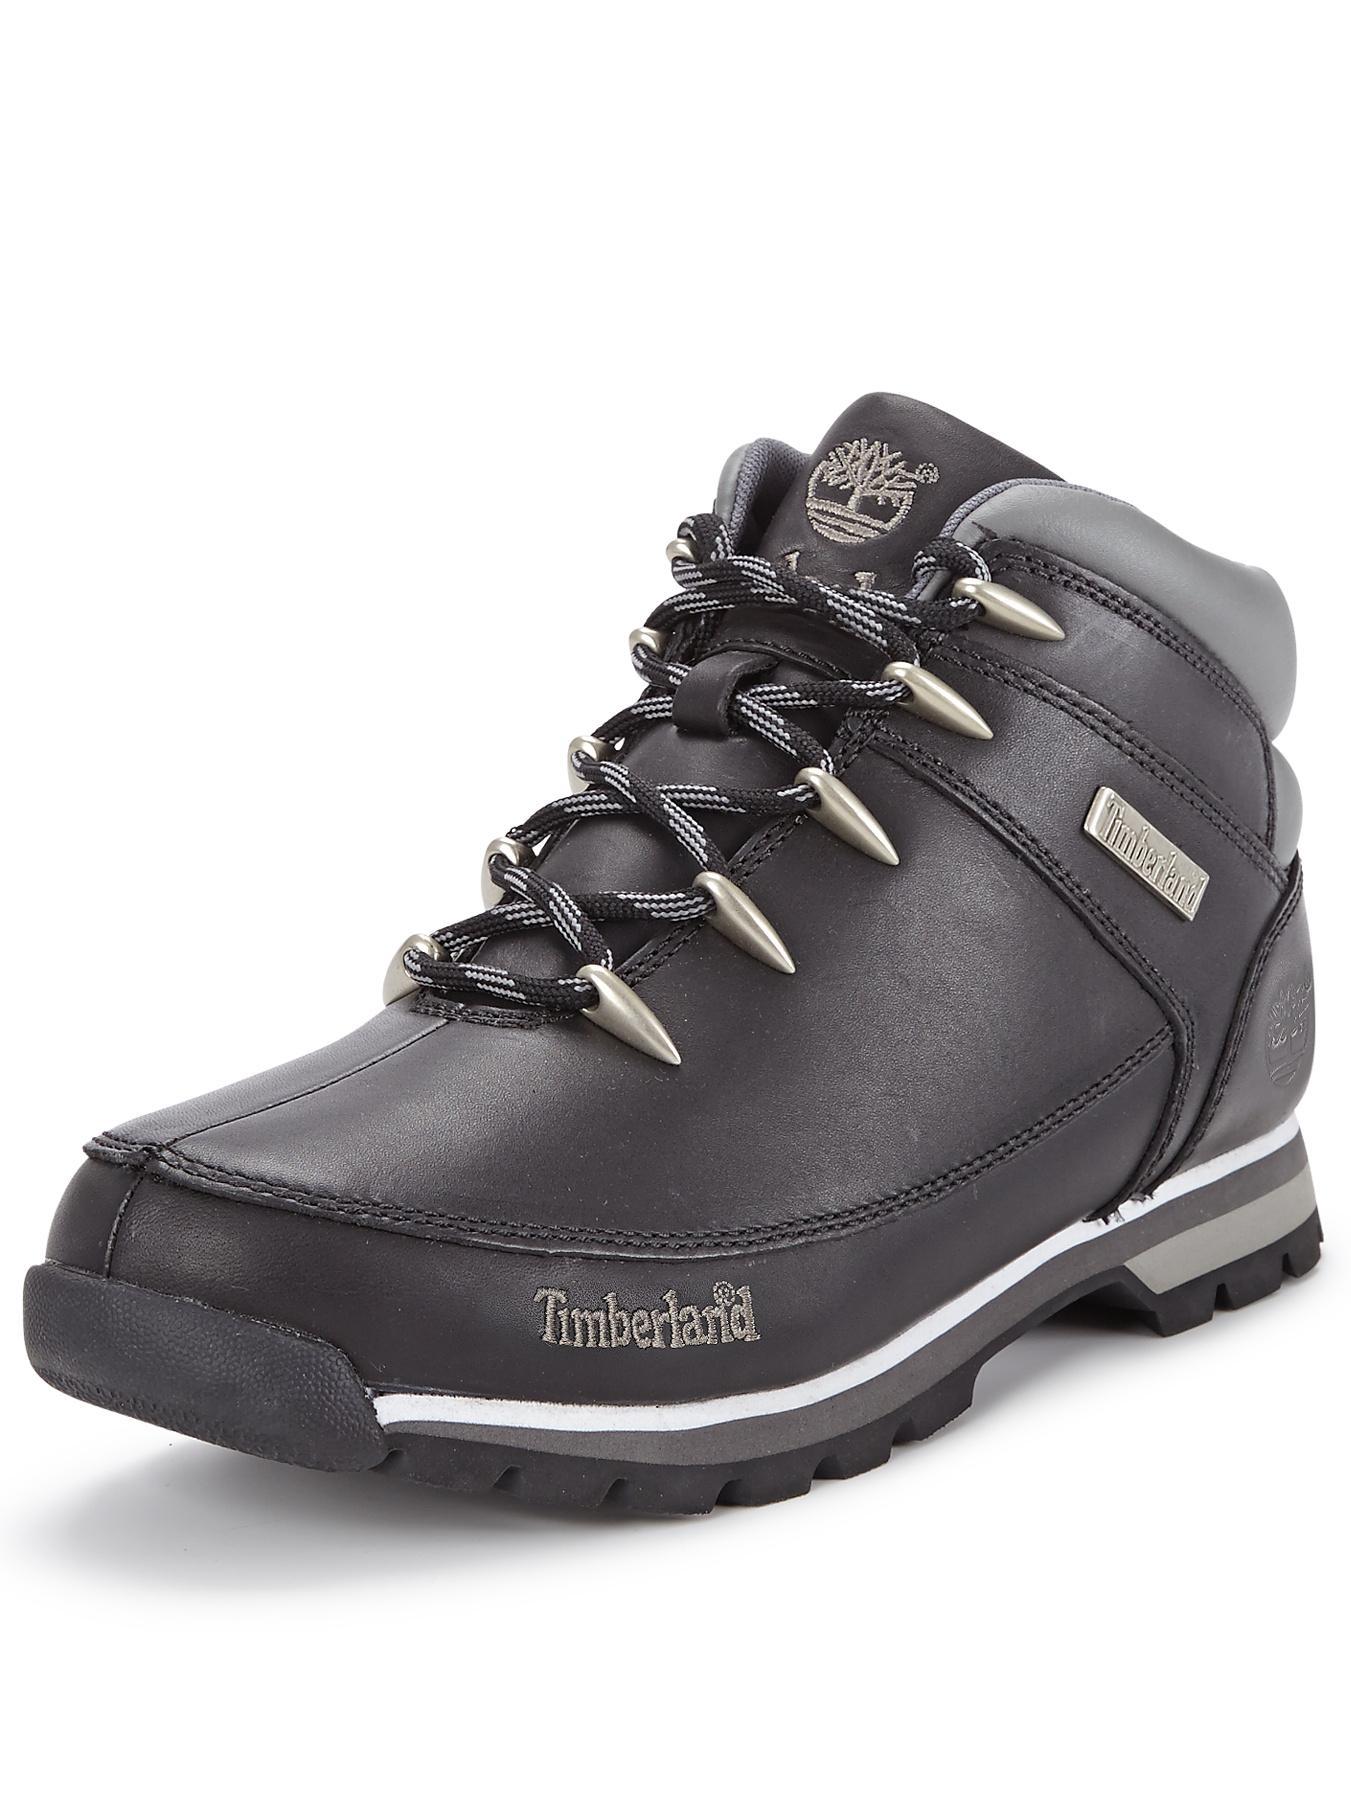 Timberland Eurosprint Boots - Black, Black